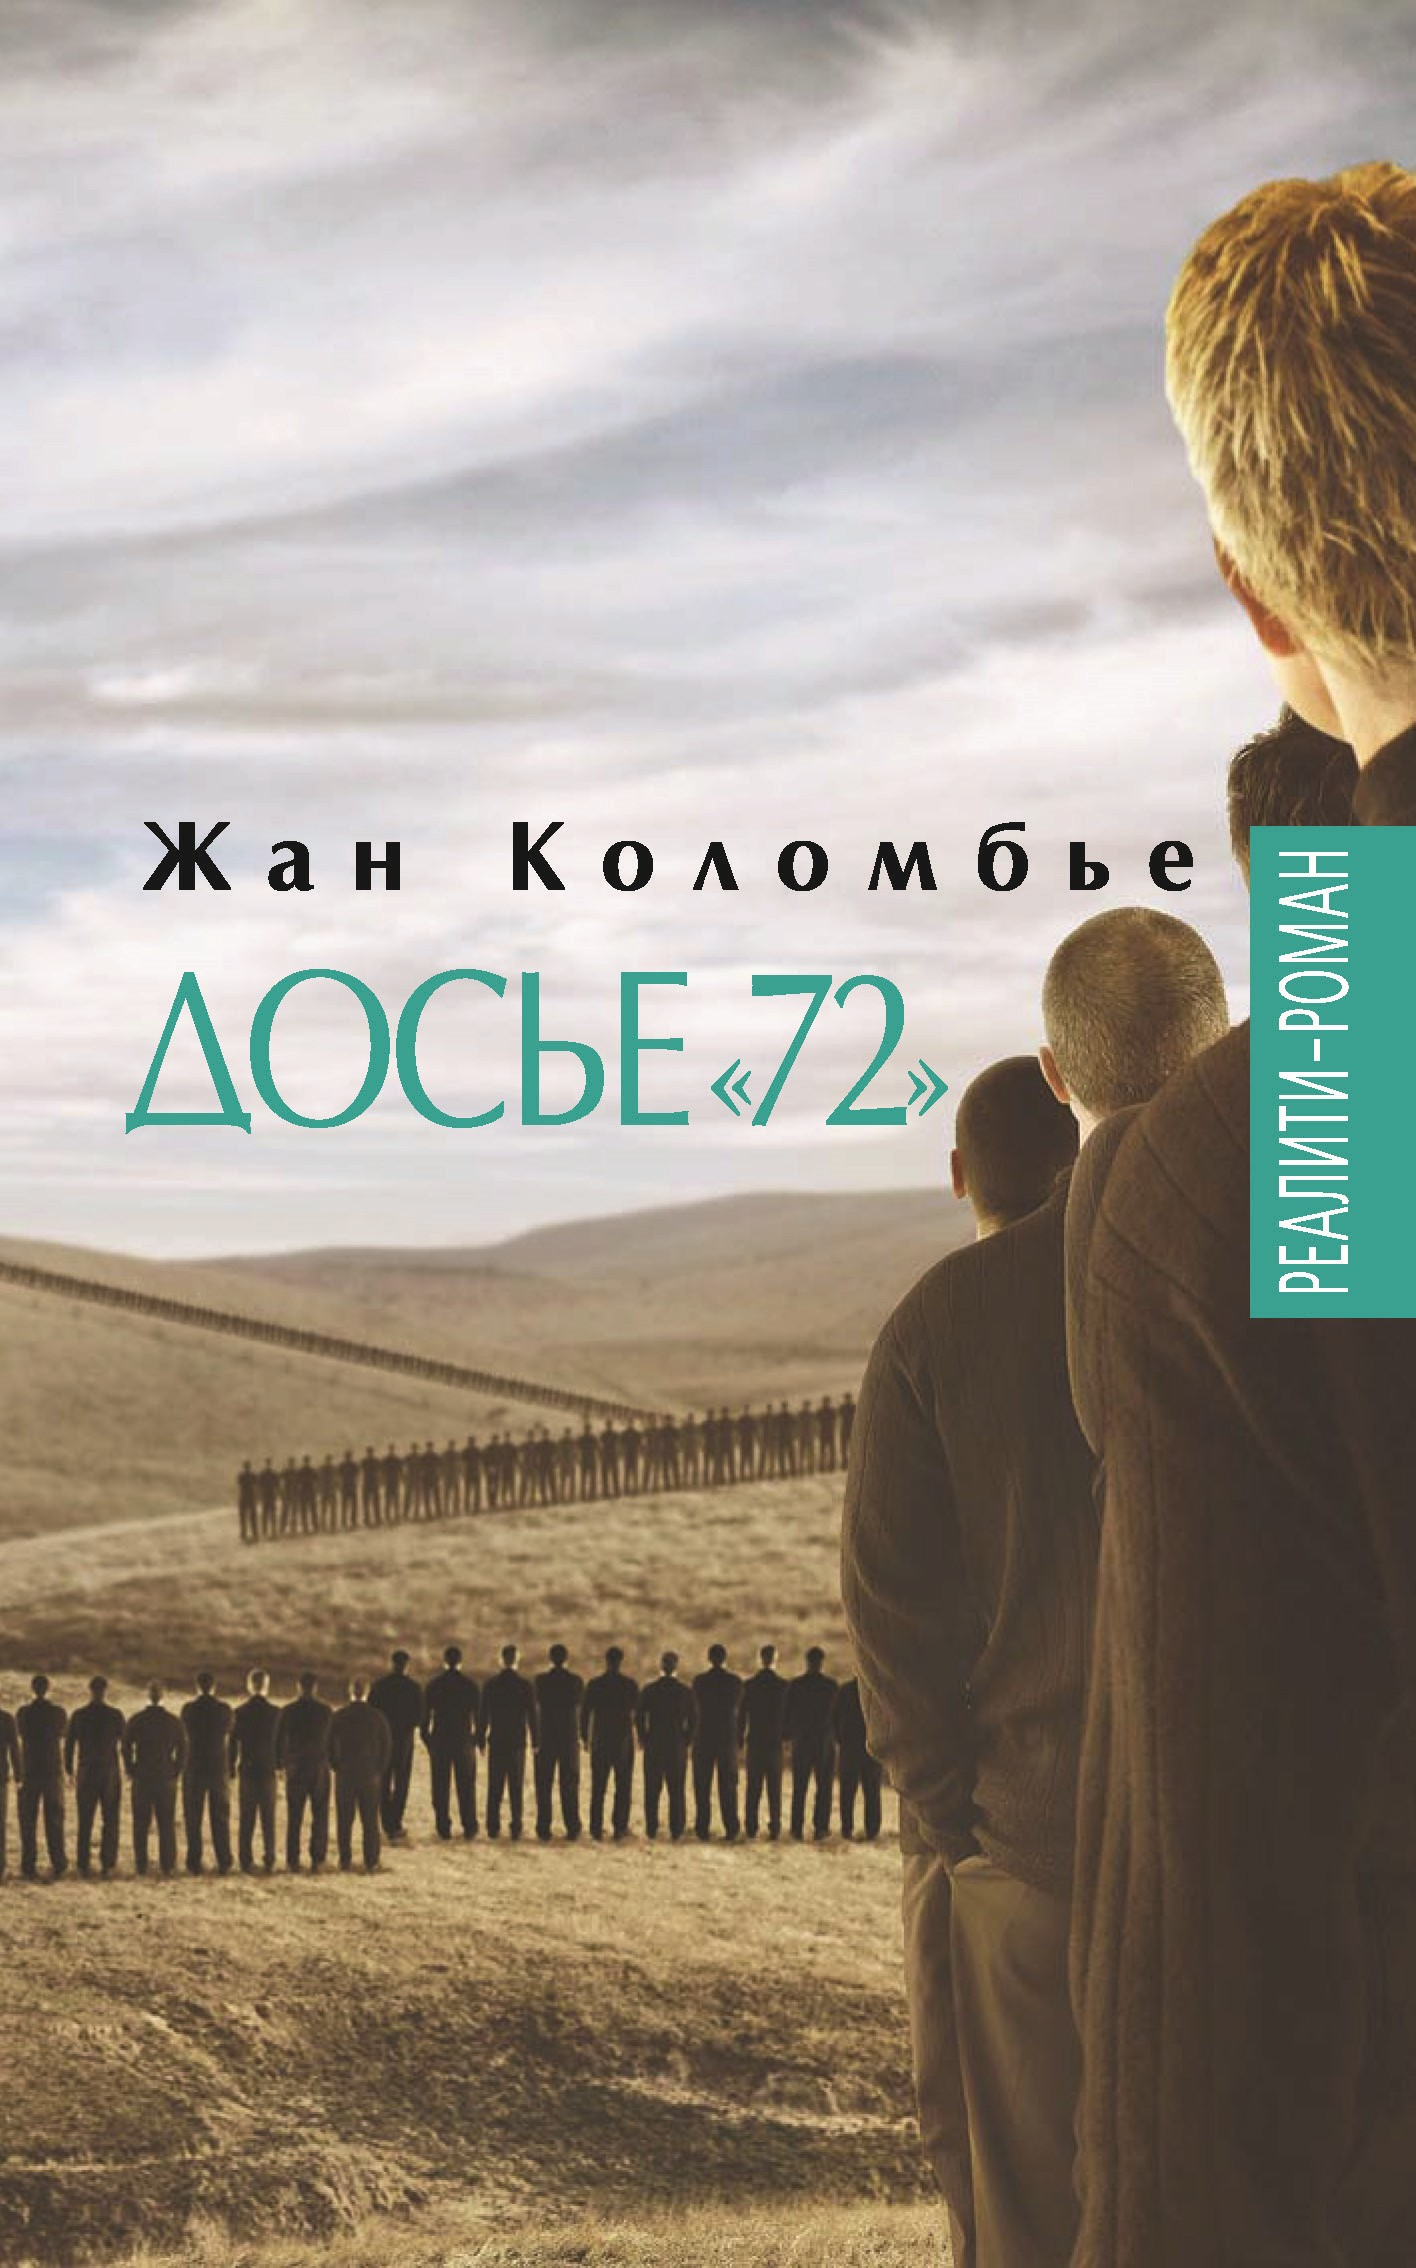 Досье «72»